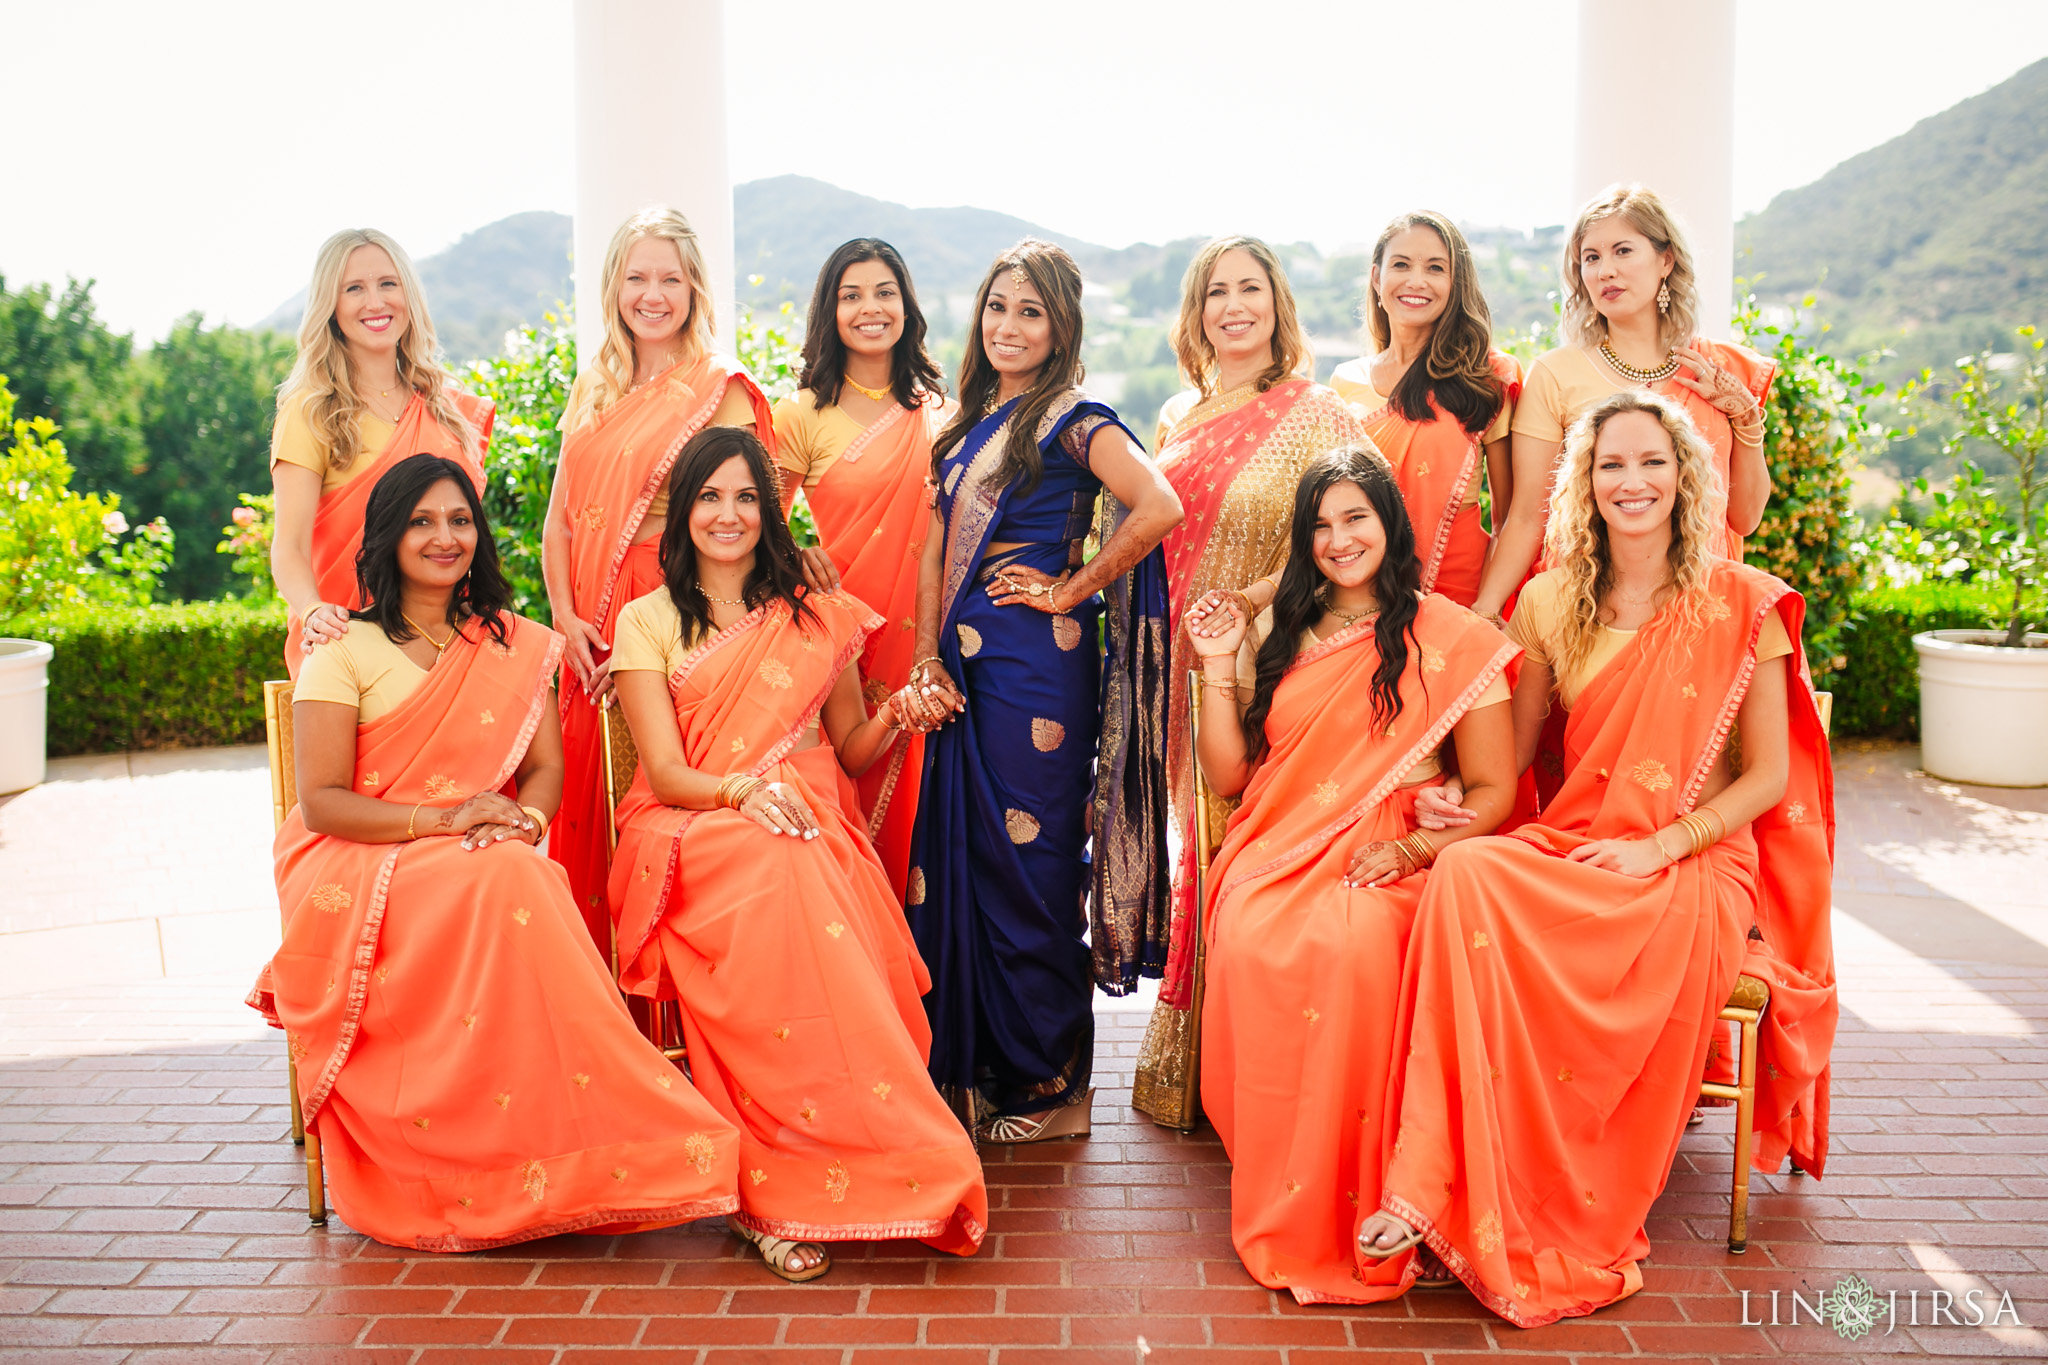 006 sherwood country club indian bridesmaids wedding photography